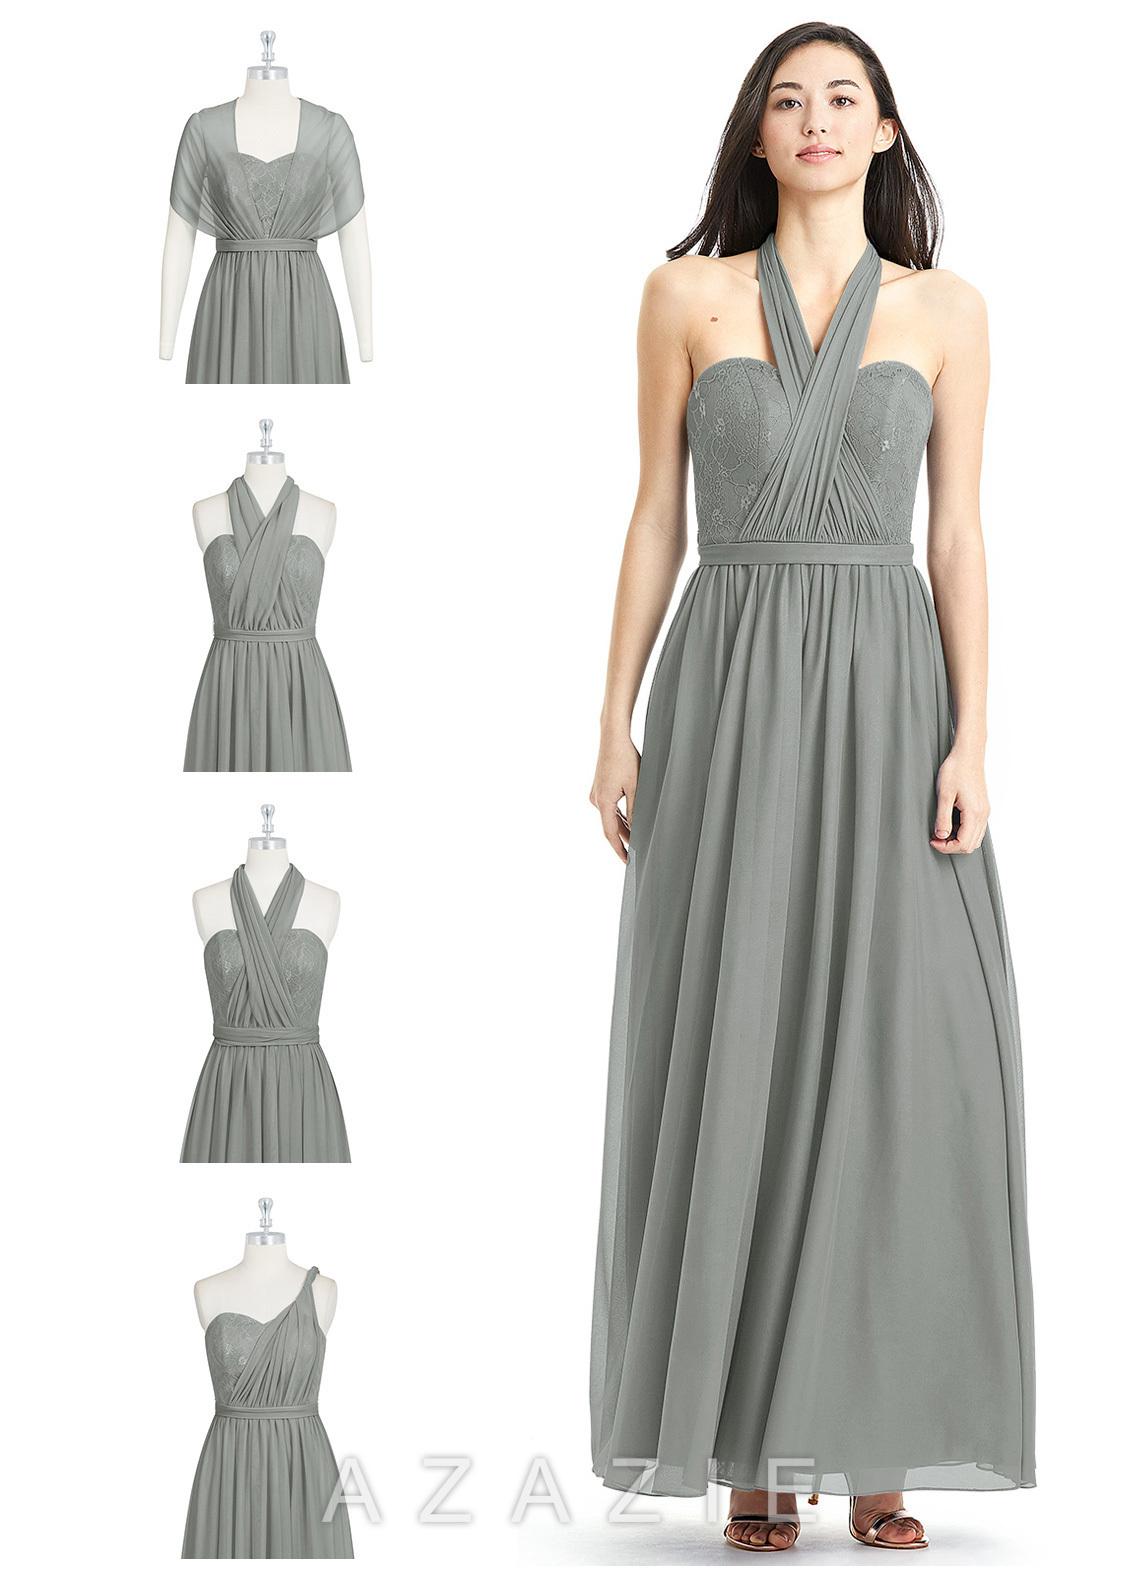 c484806b5f2 Azazie Yesenia Bridesmaid Dress